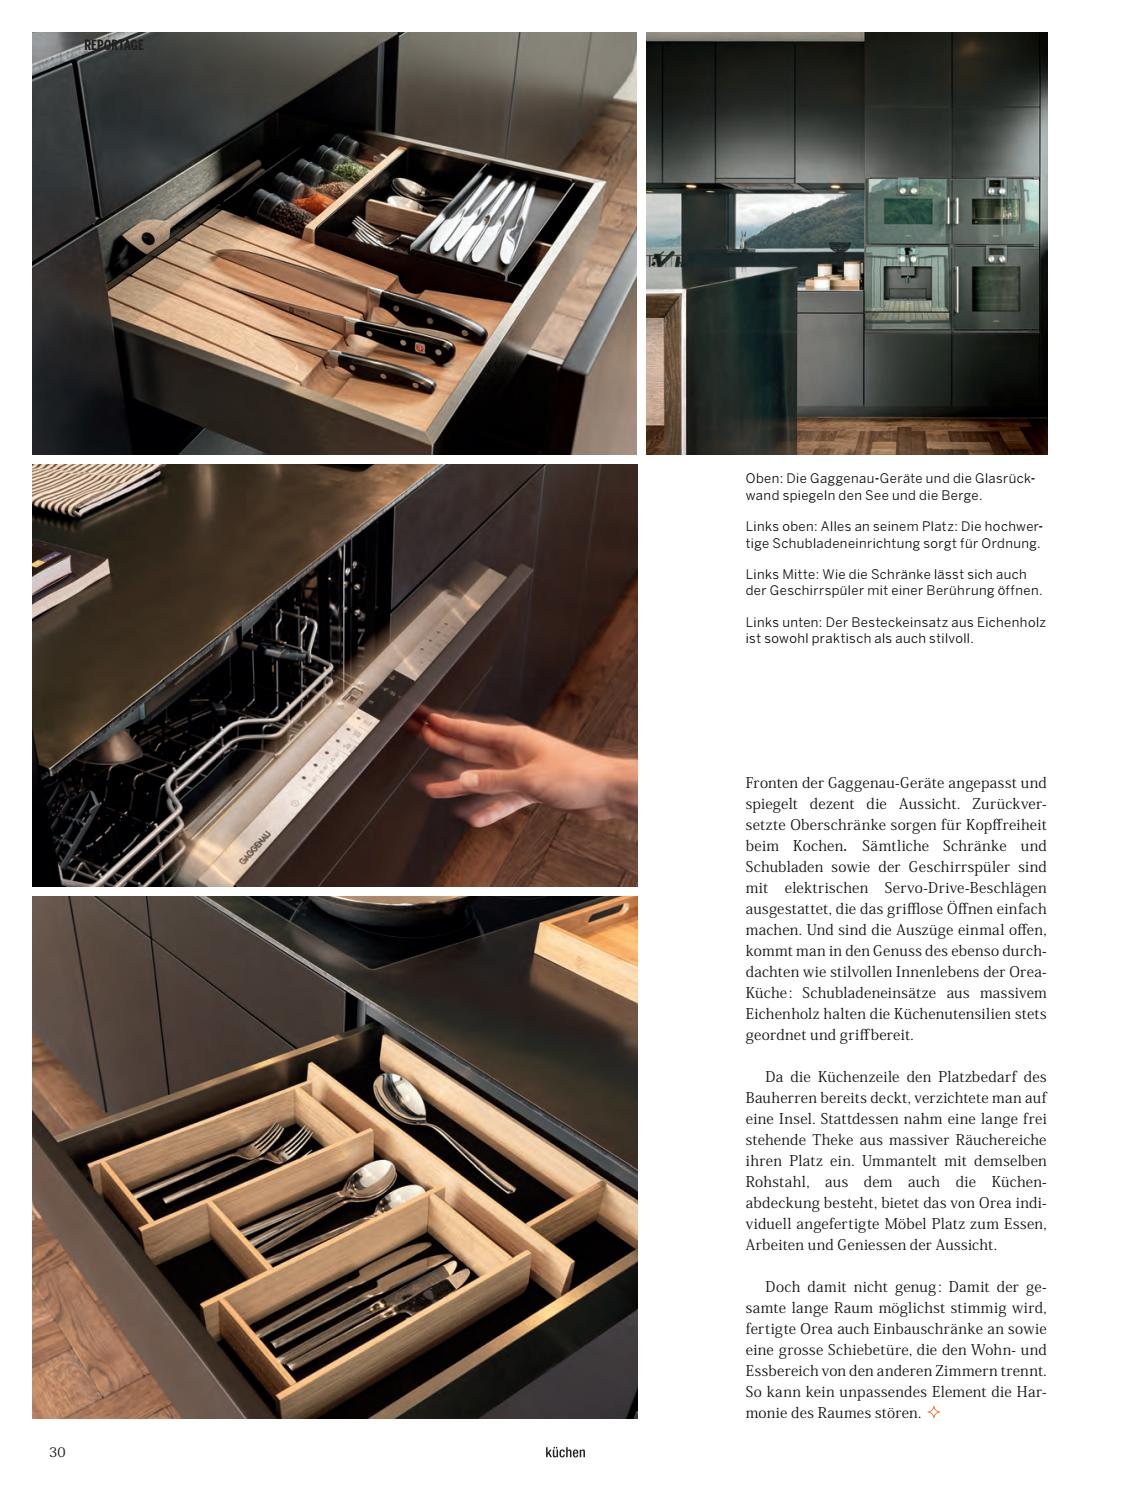 Erfreut Storen Küche Fotos - Küche Set Ideen - deriherusweets.info